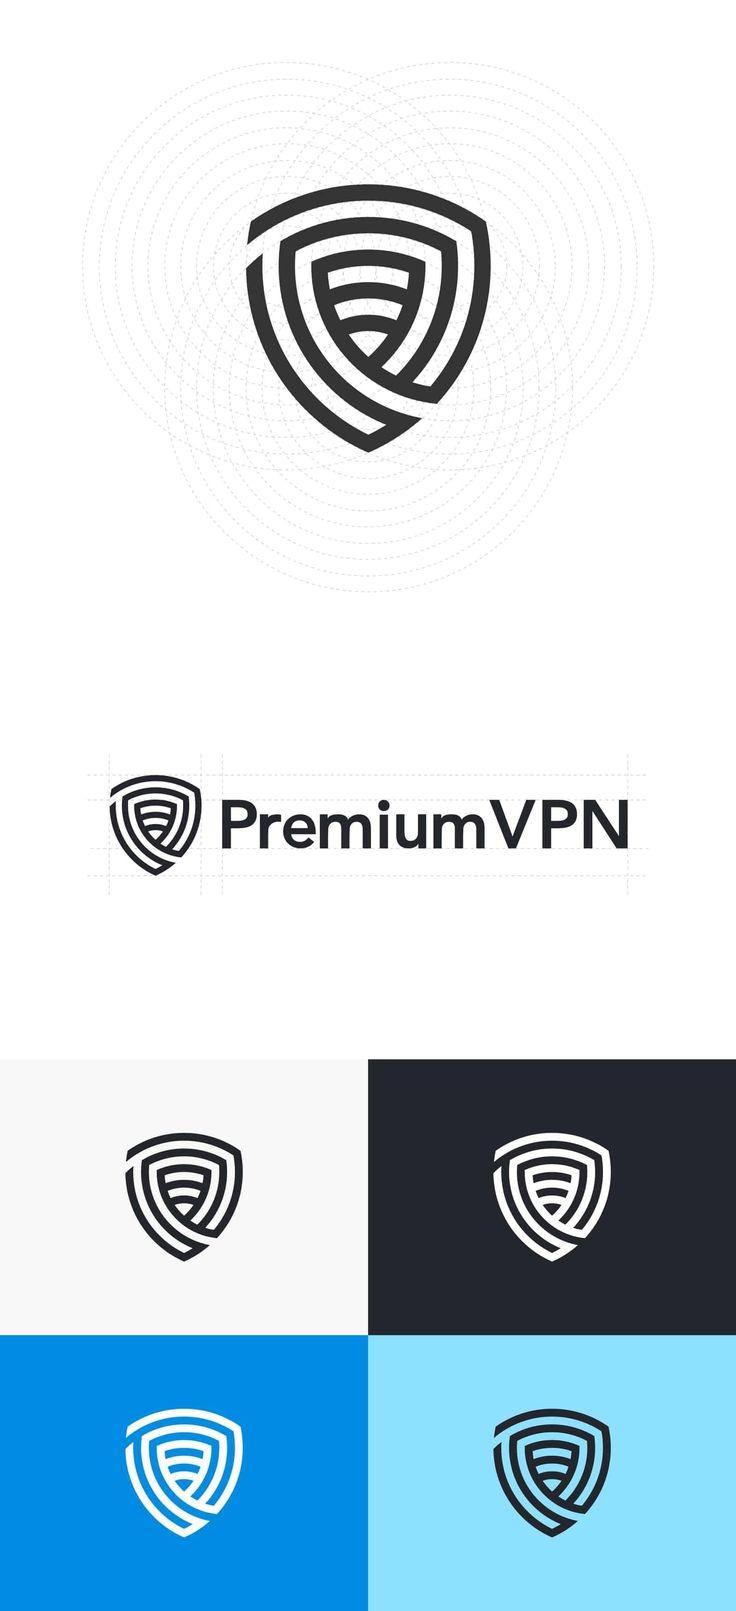 PremiumVPN in 2020 Web design, My favorite things, Brand